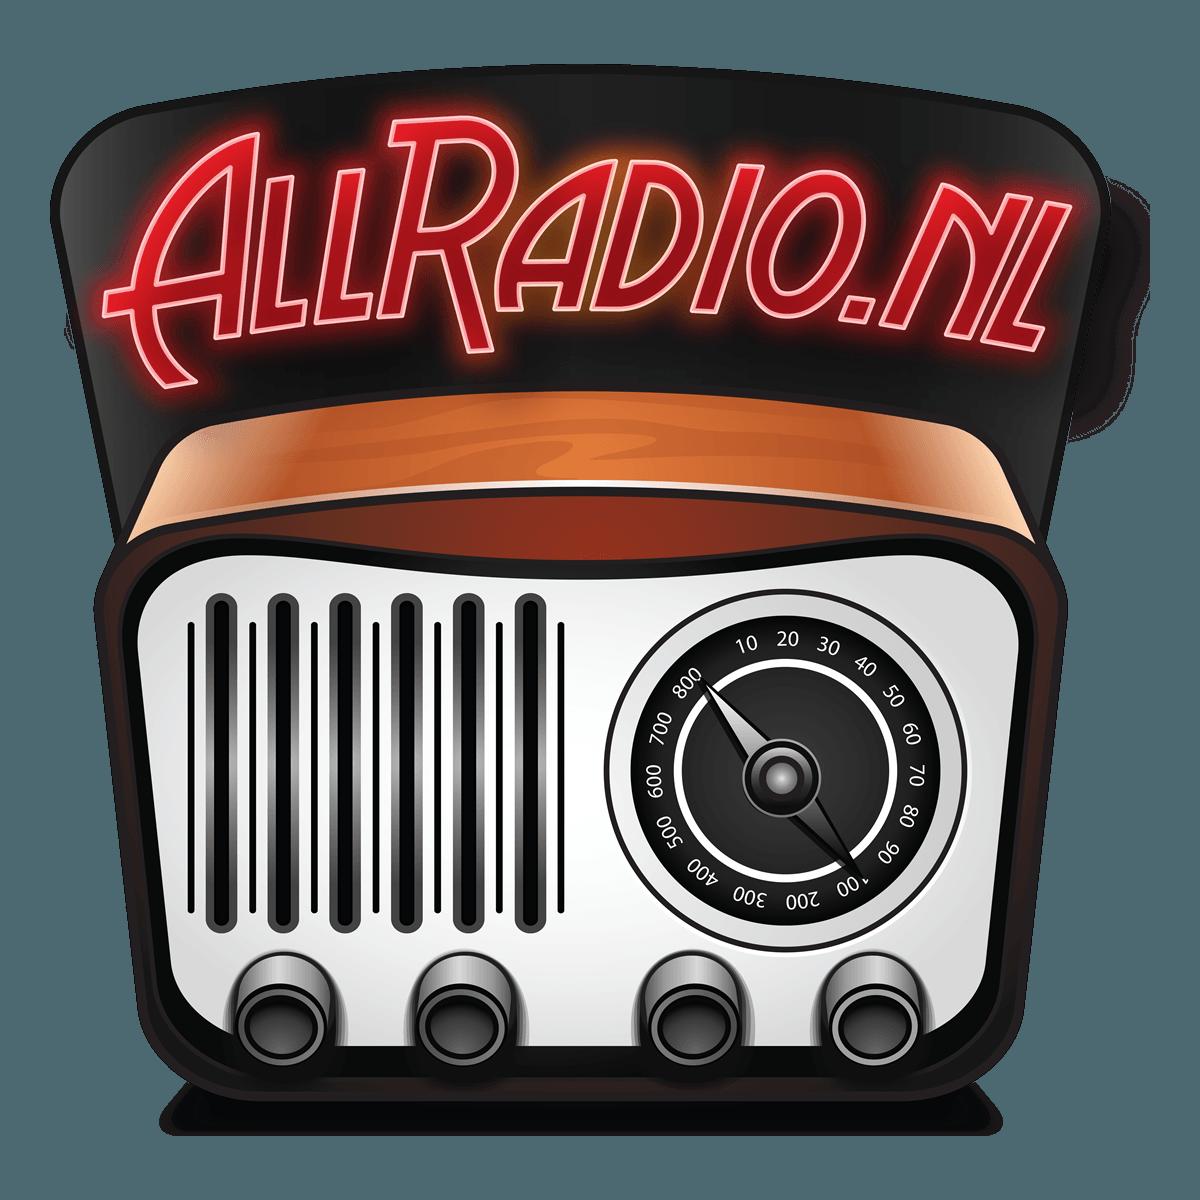 (c) Allradio.nl